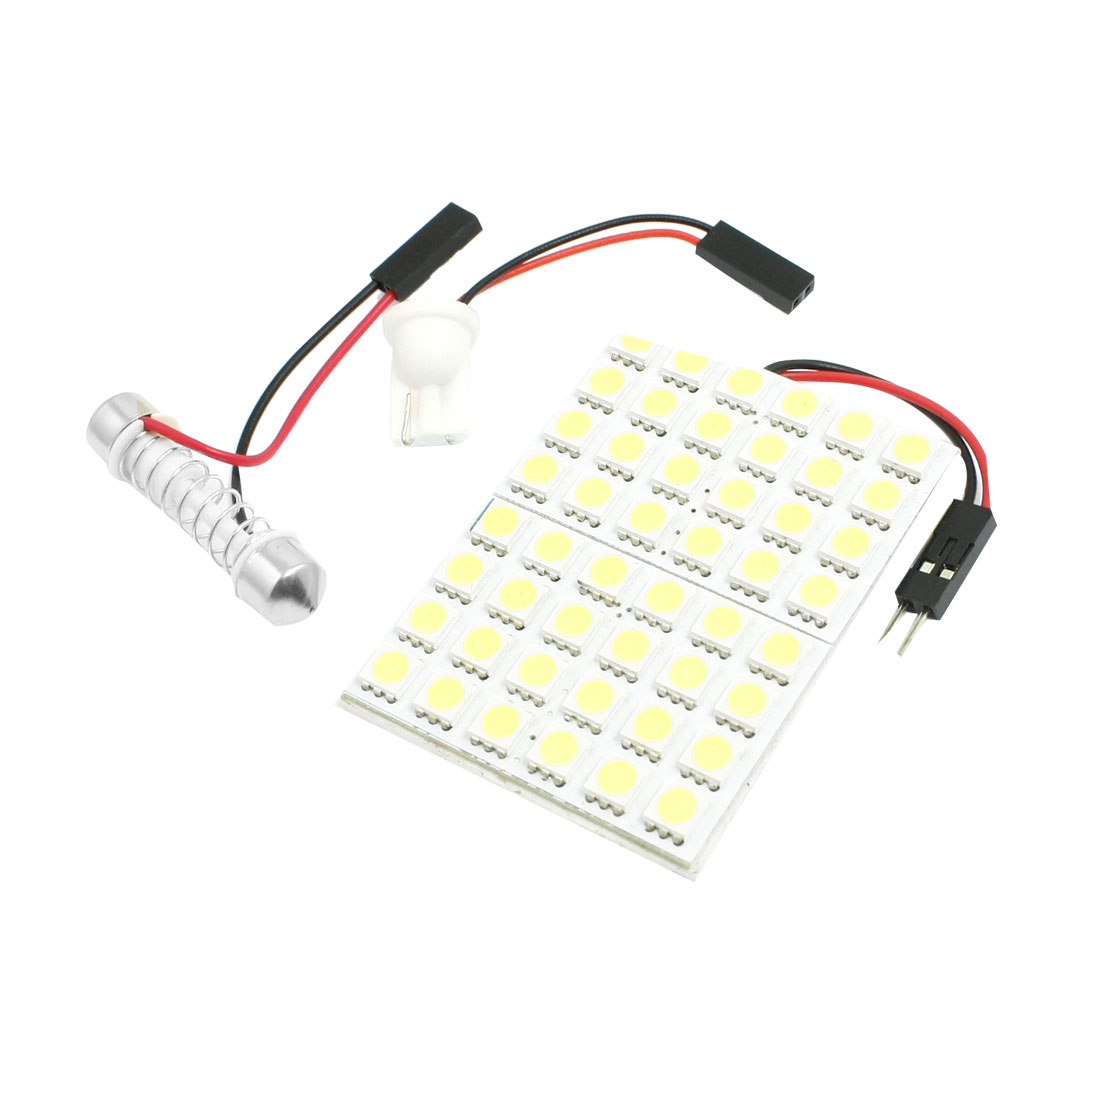 Car White 5050 SMD 48-LED Dome Light Lamp w T10 Festoon Adapter